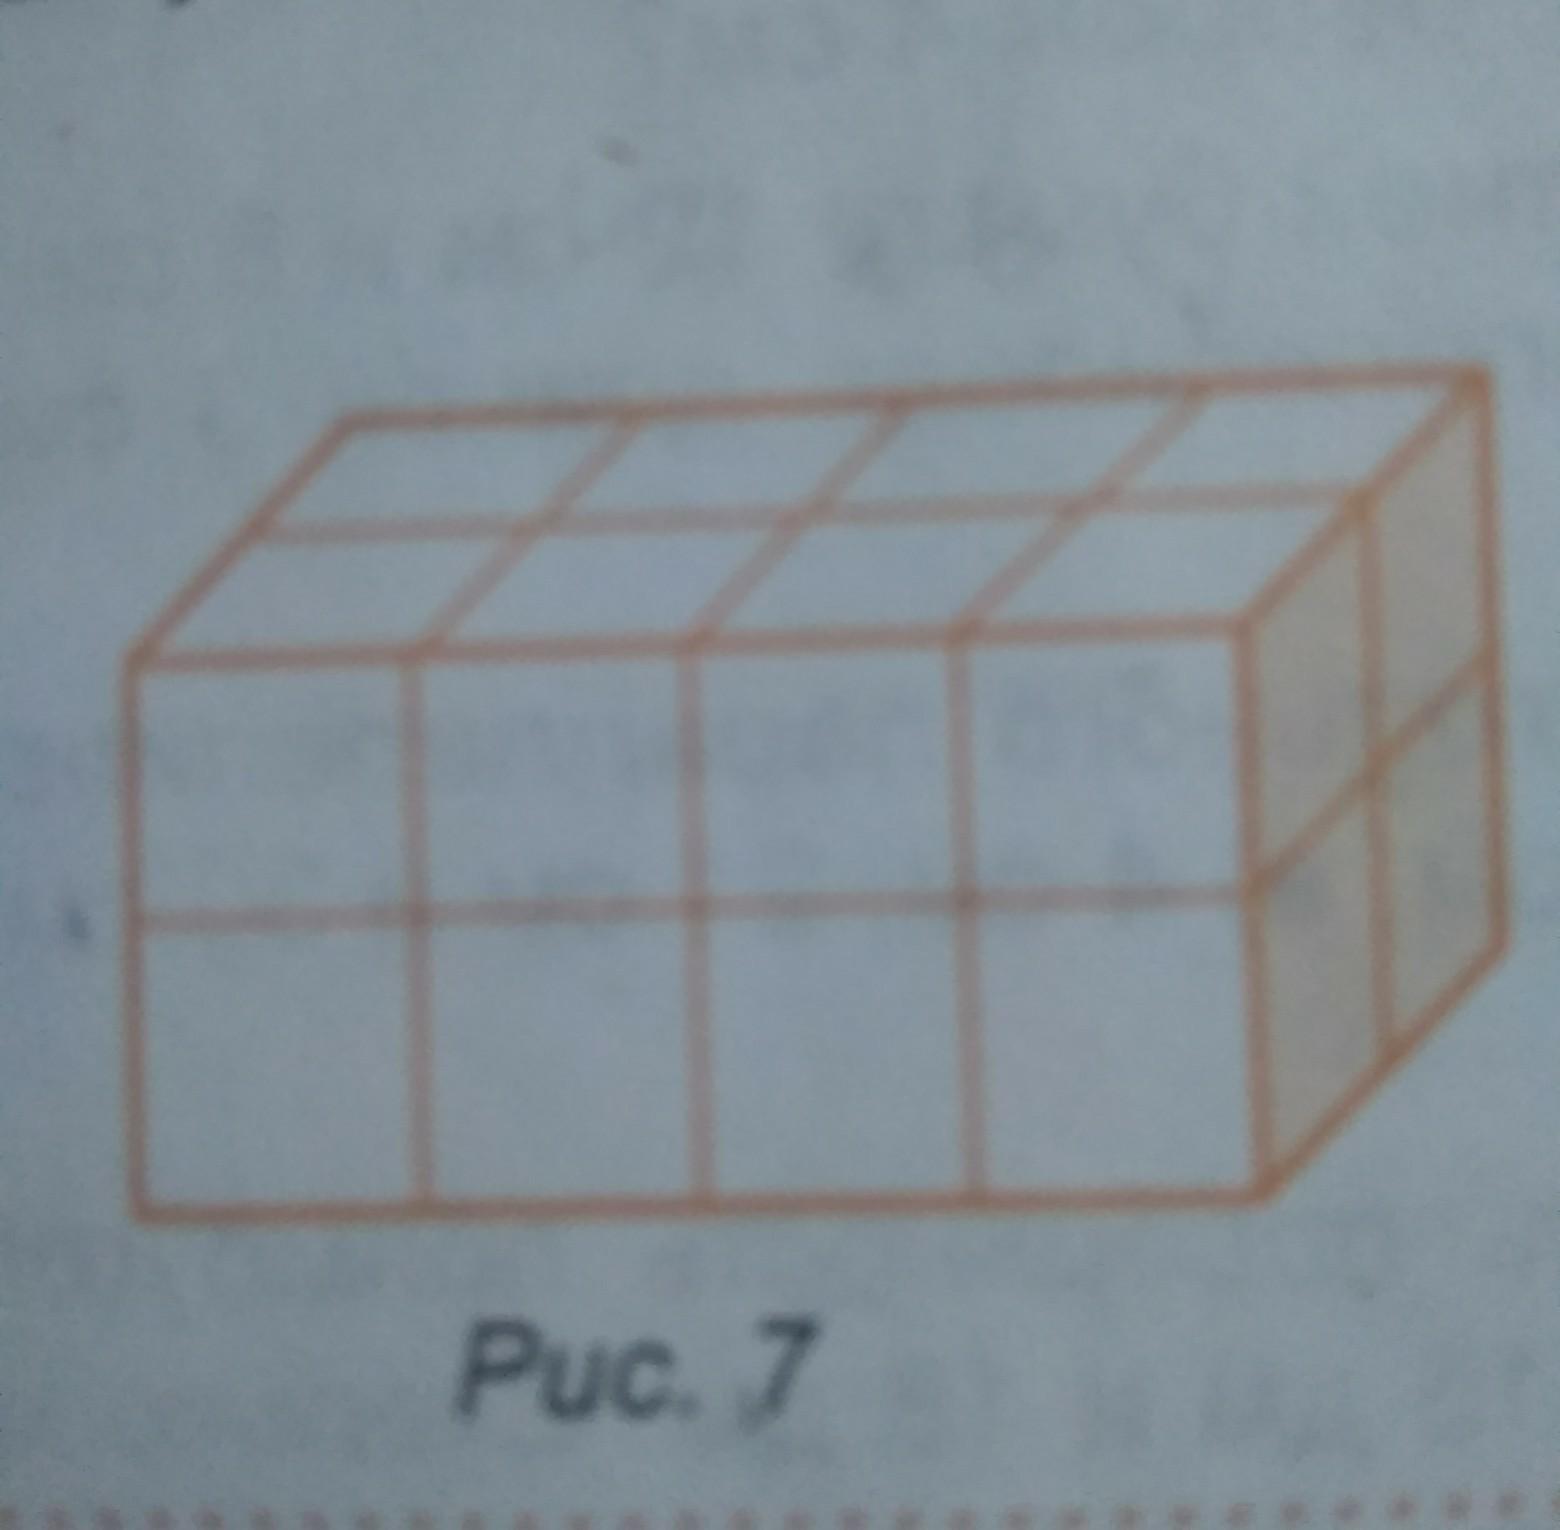 ДАЮ 14 БАЛЛОВиз кубов с ребрами 3 см построен